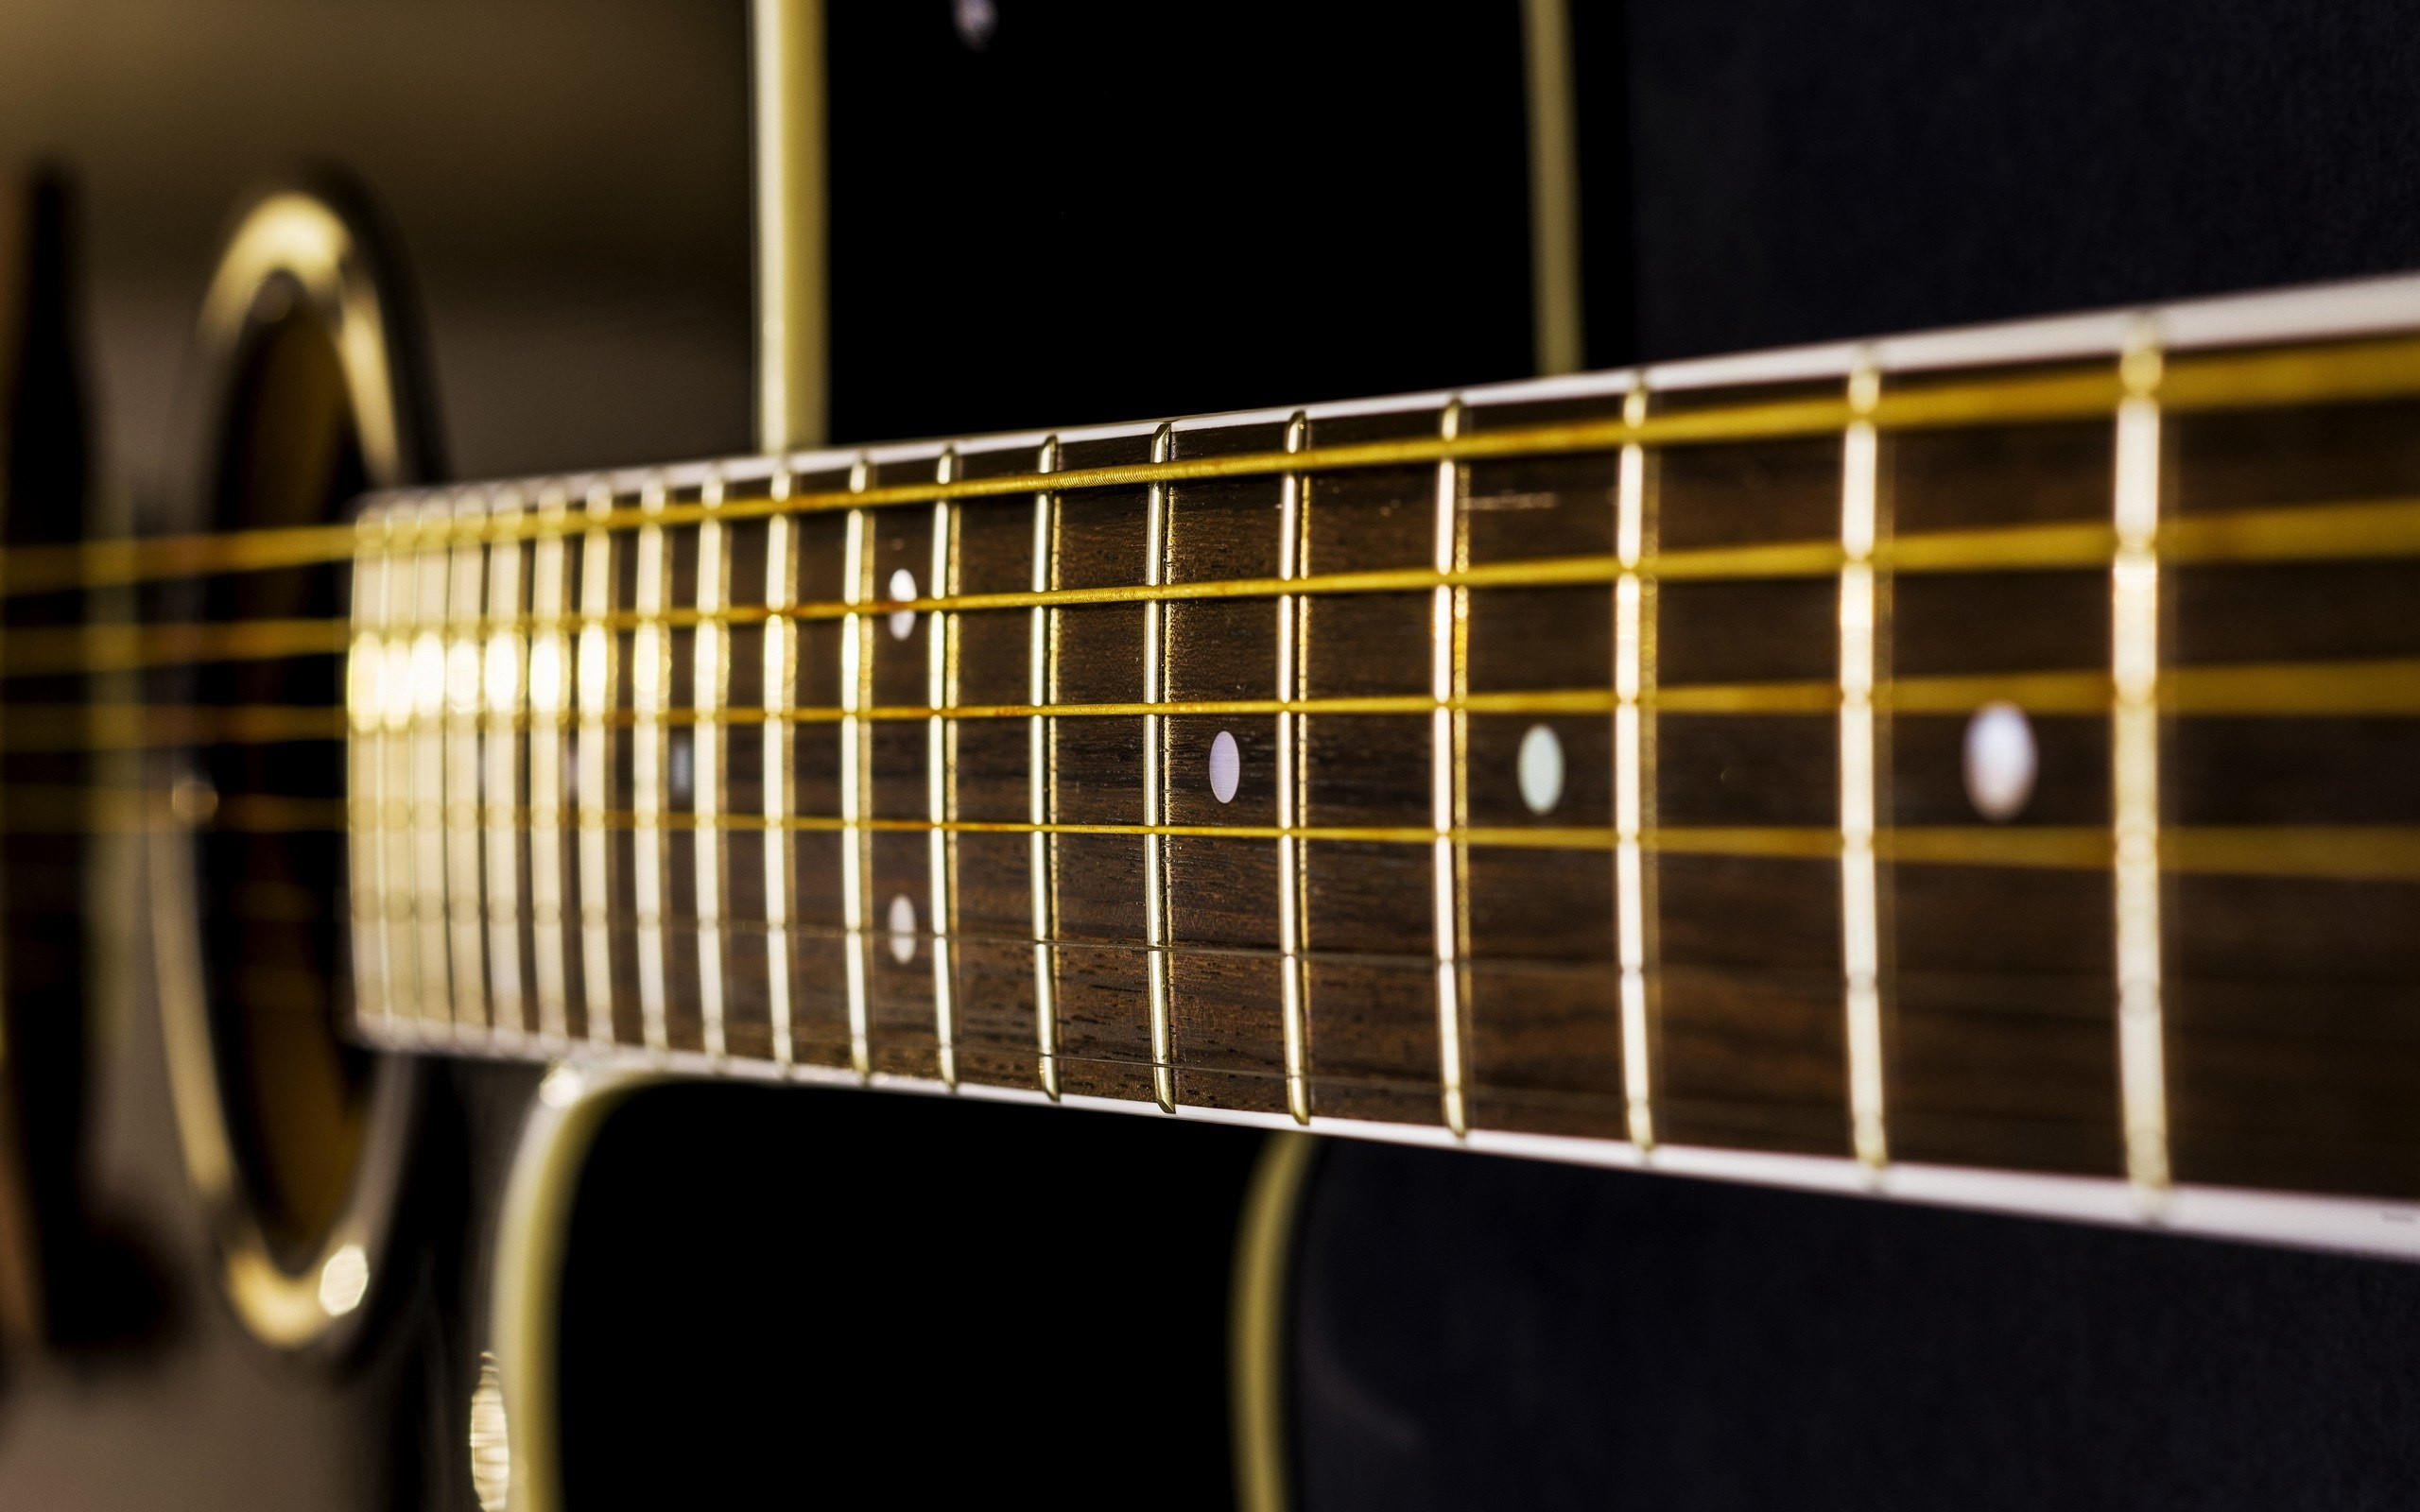 Black 3d Hd Wallpapers 1080p Widescreen Electric Guitar Wallpaper 69 Images